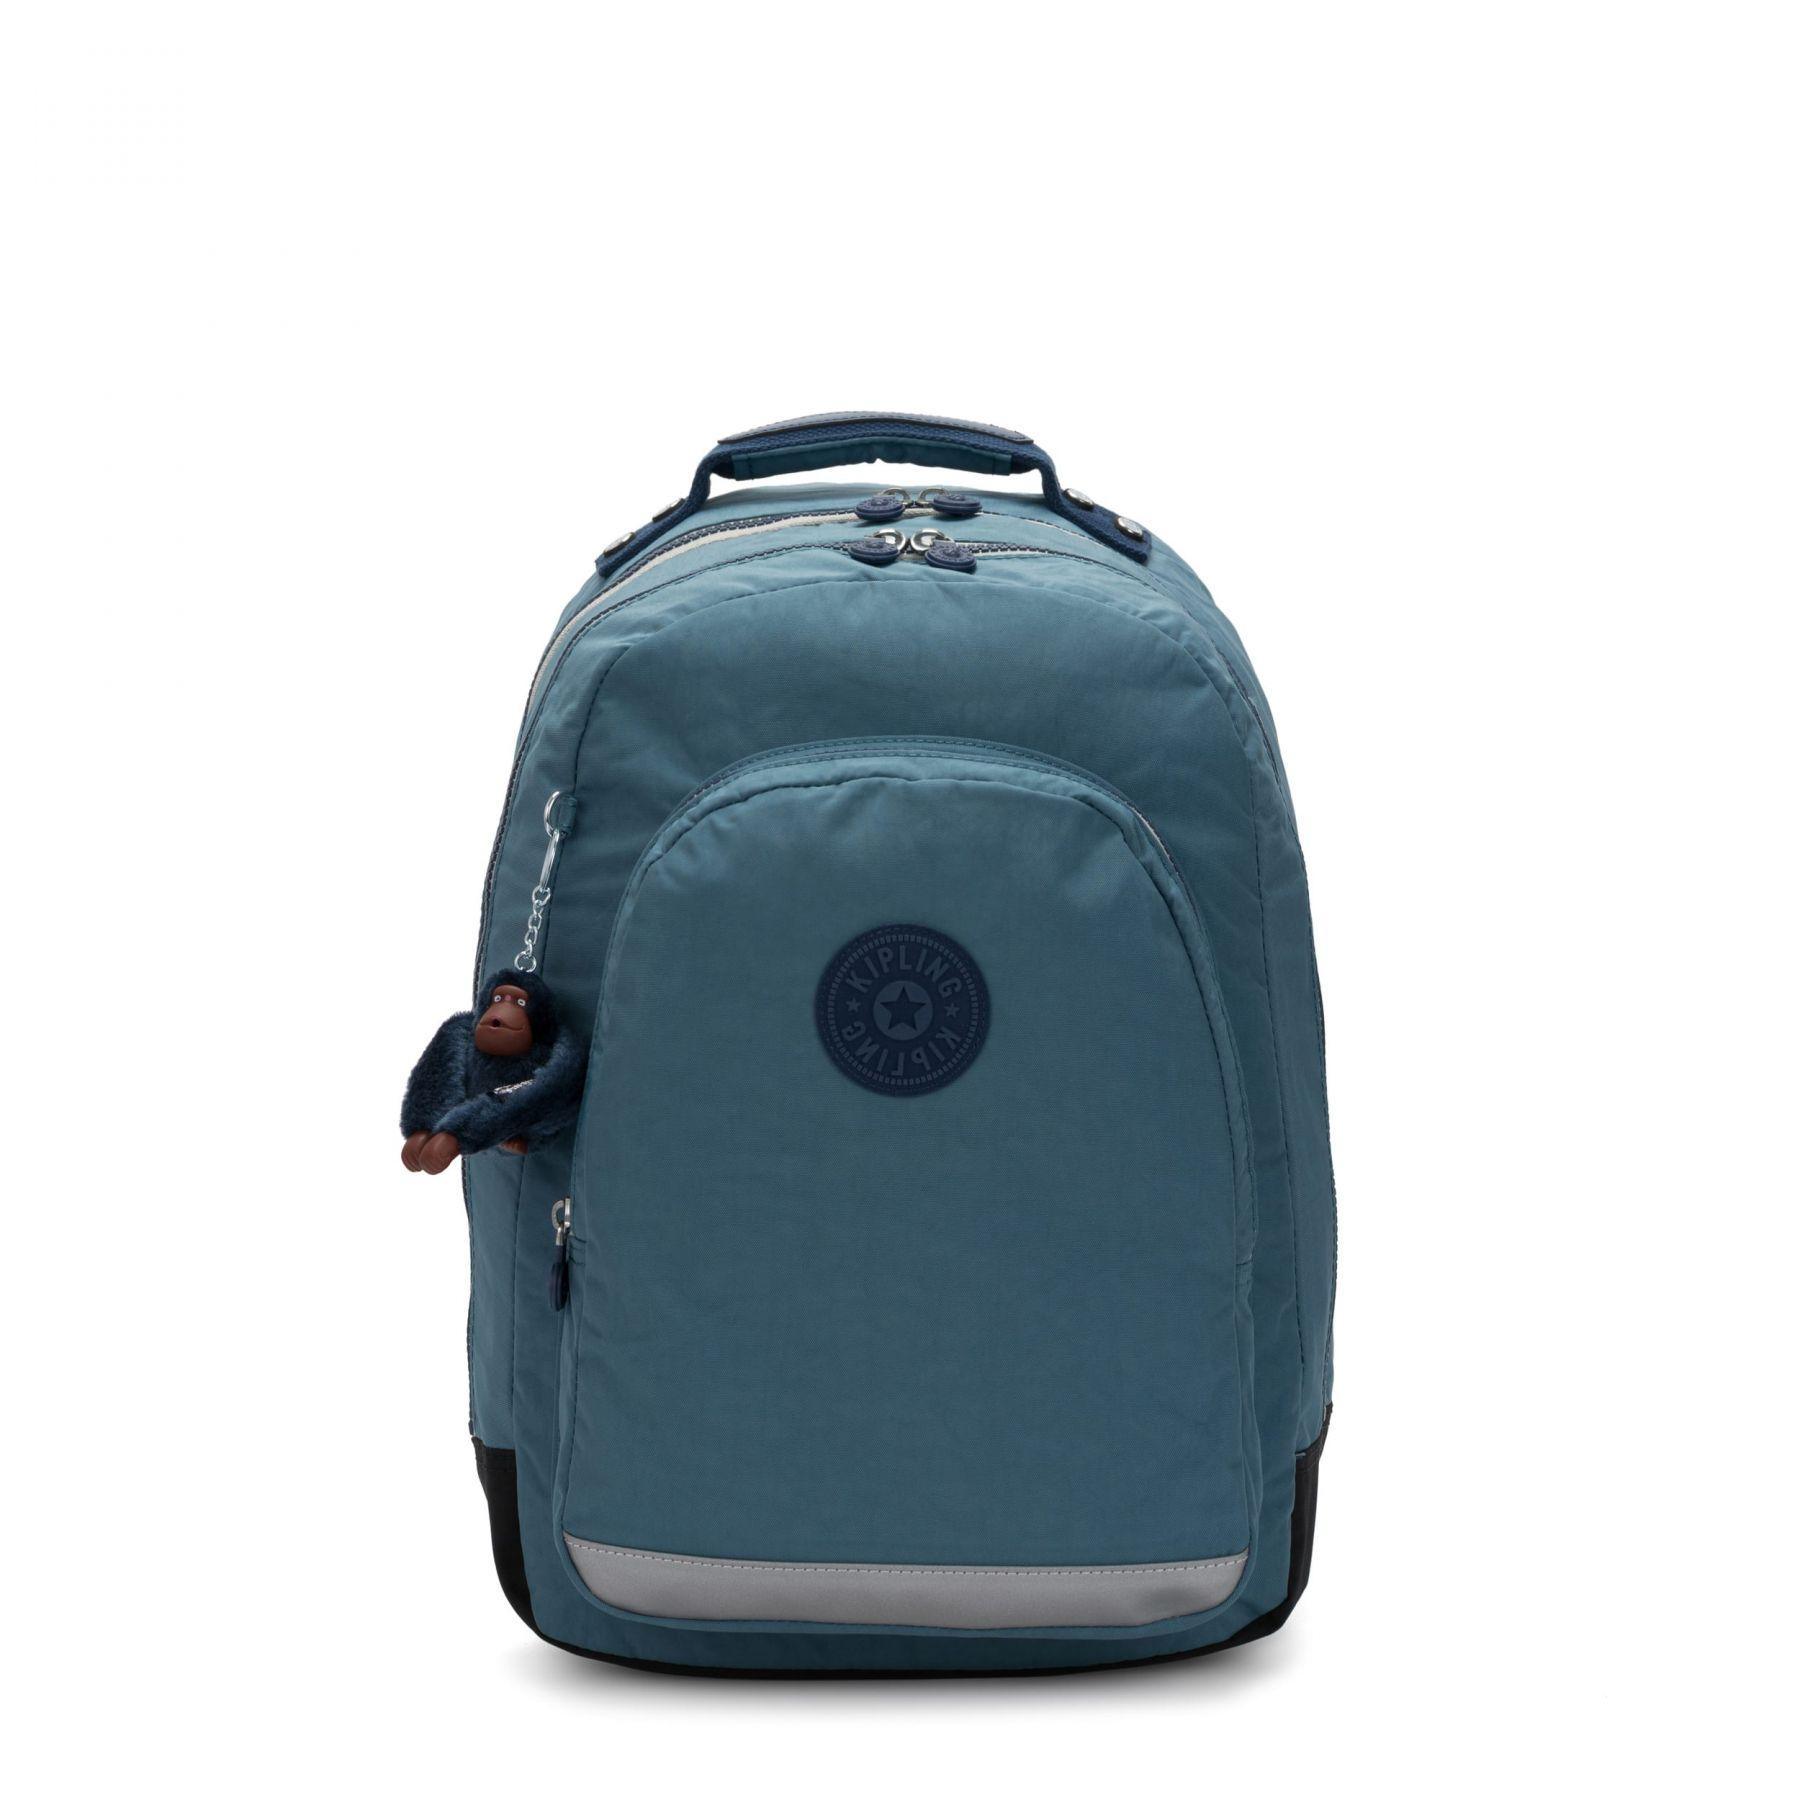 CLASS ROOM SCHOOL BAGS by Kipling